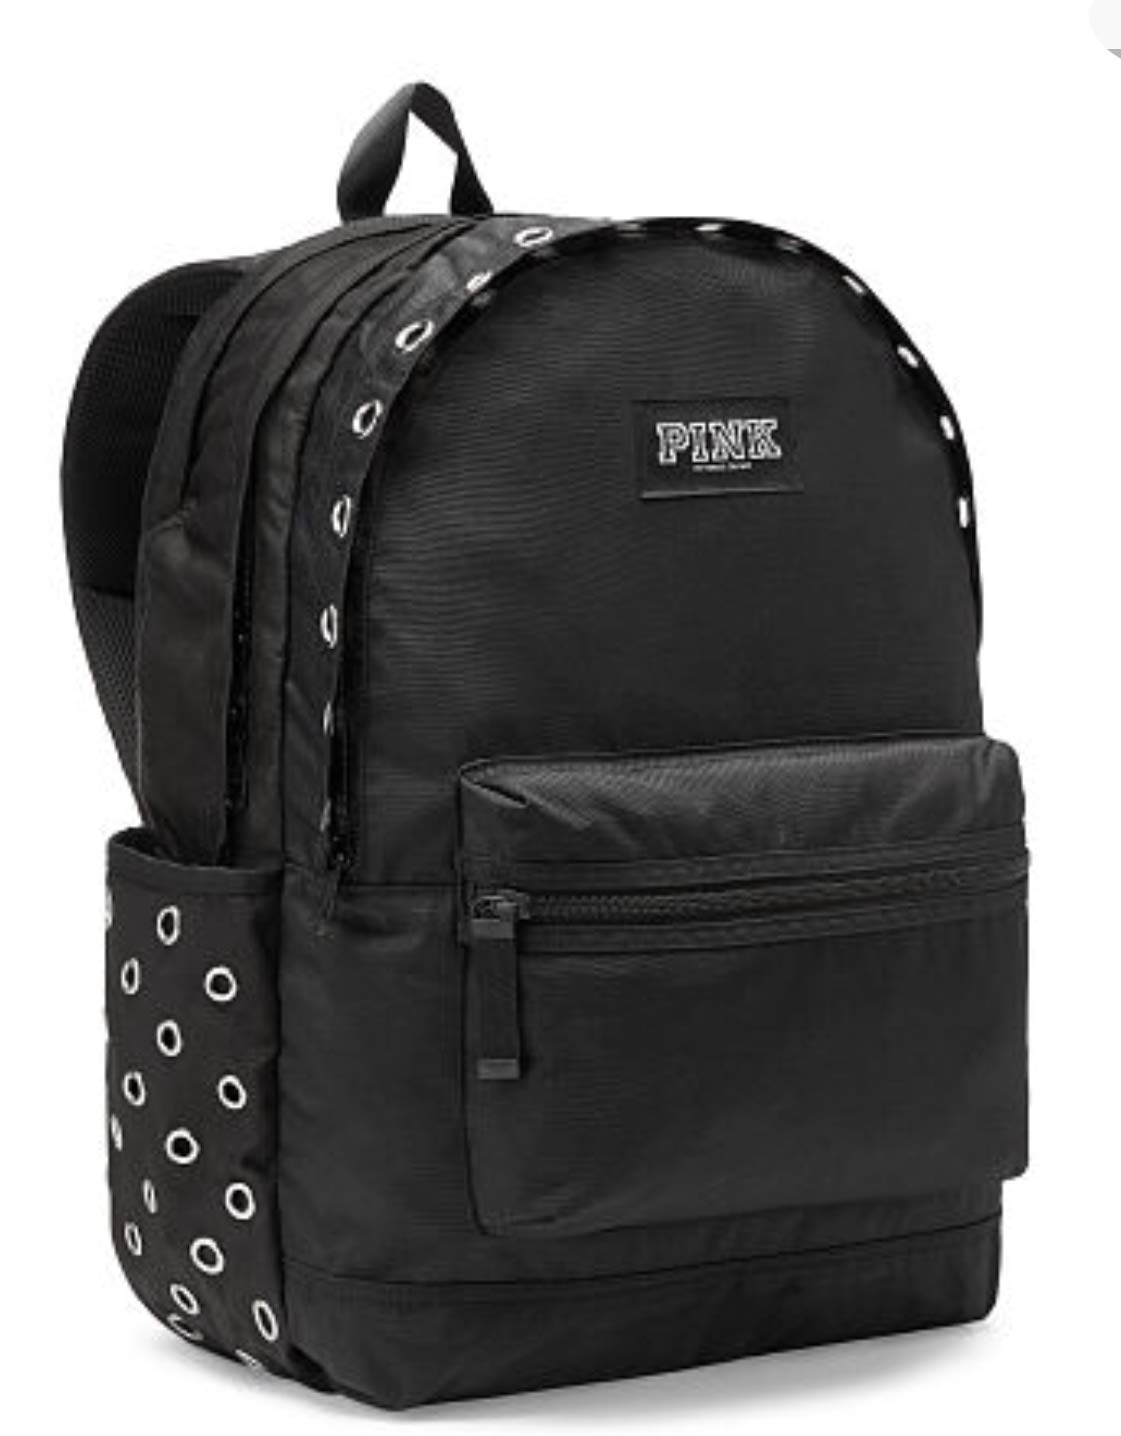 30f76aa2846d Victoria Secret Pink Backpack Black Top Deals   Lowest Price ...